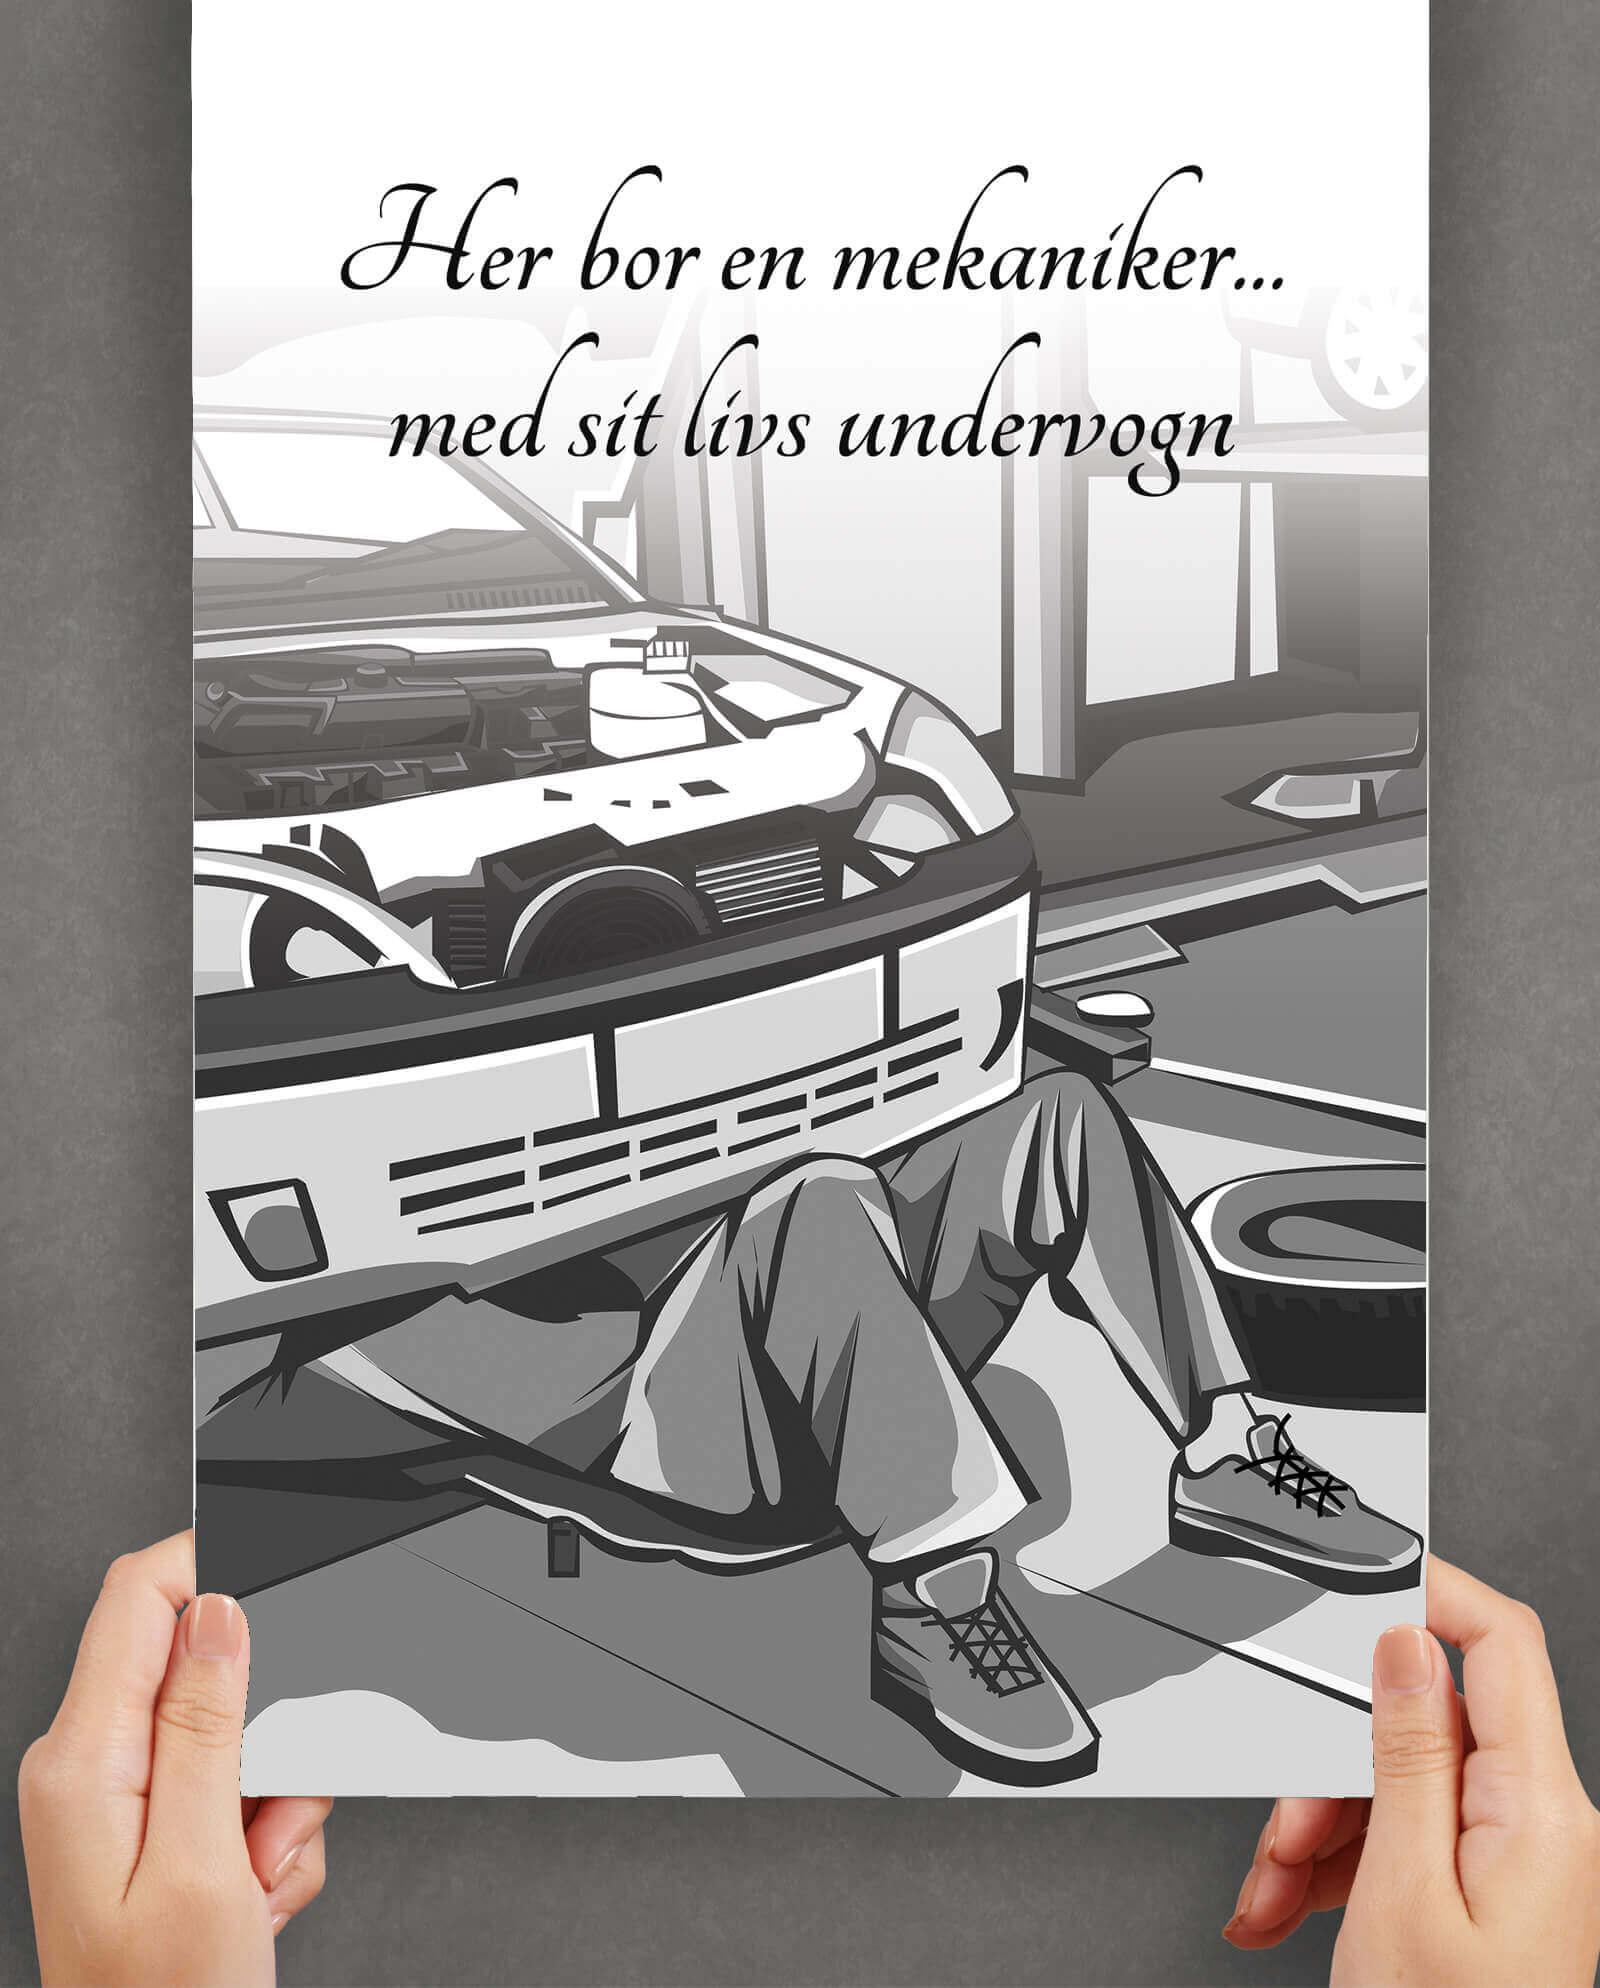 mekanier-arbejde-plakat-1